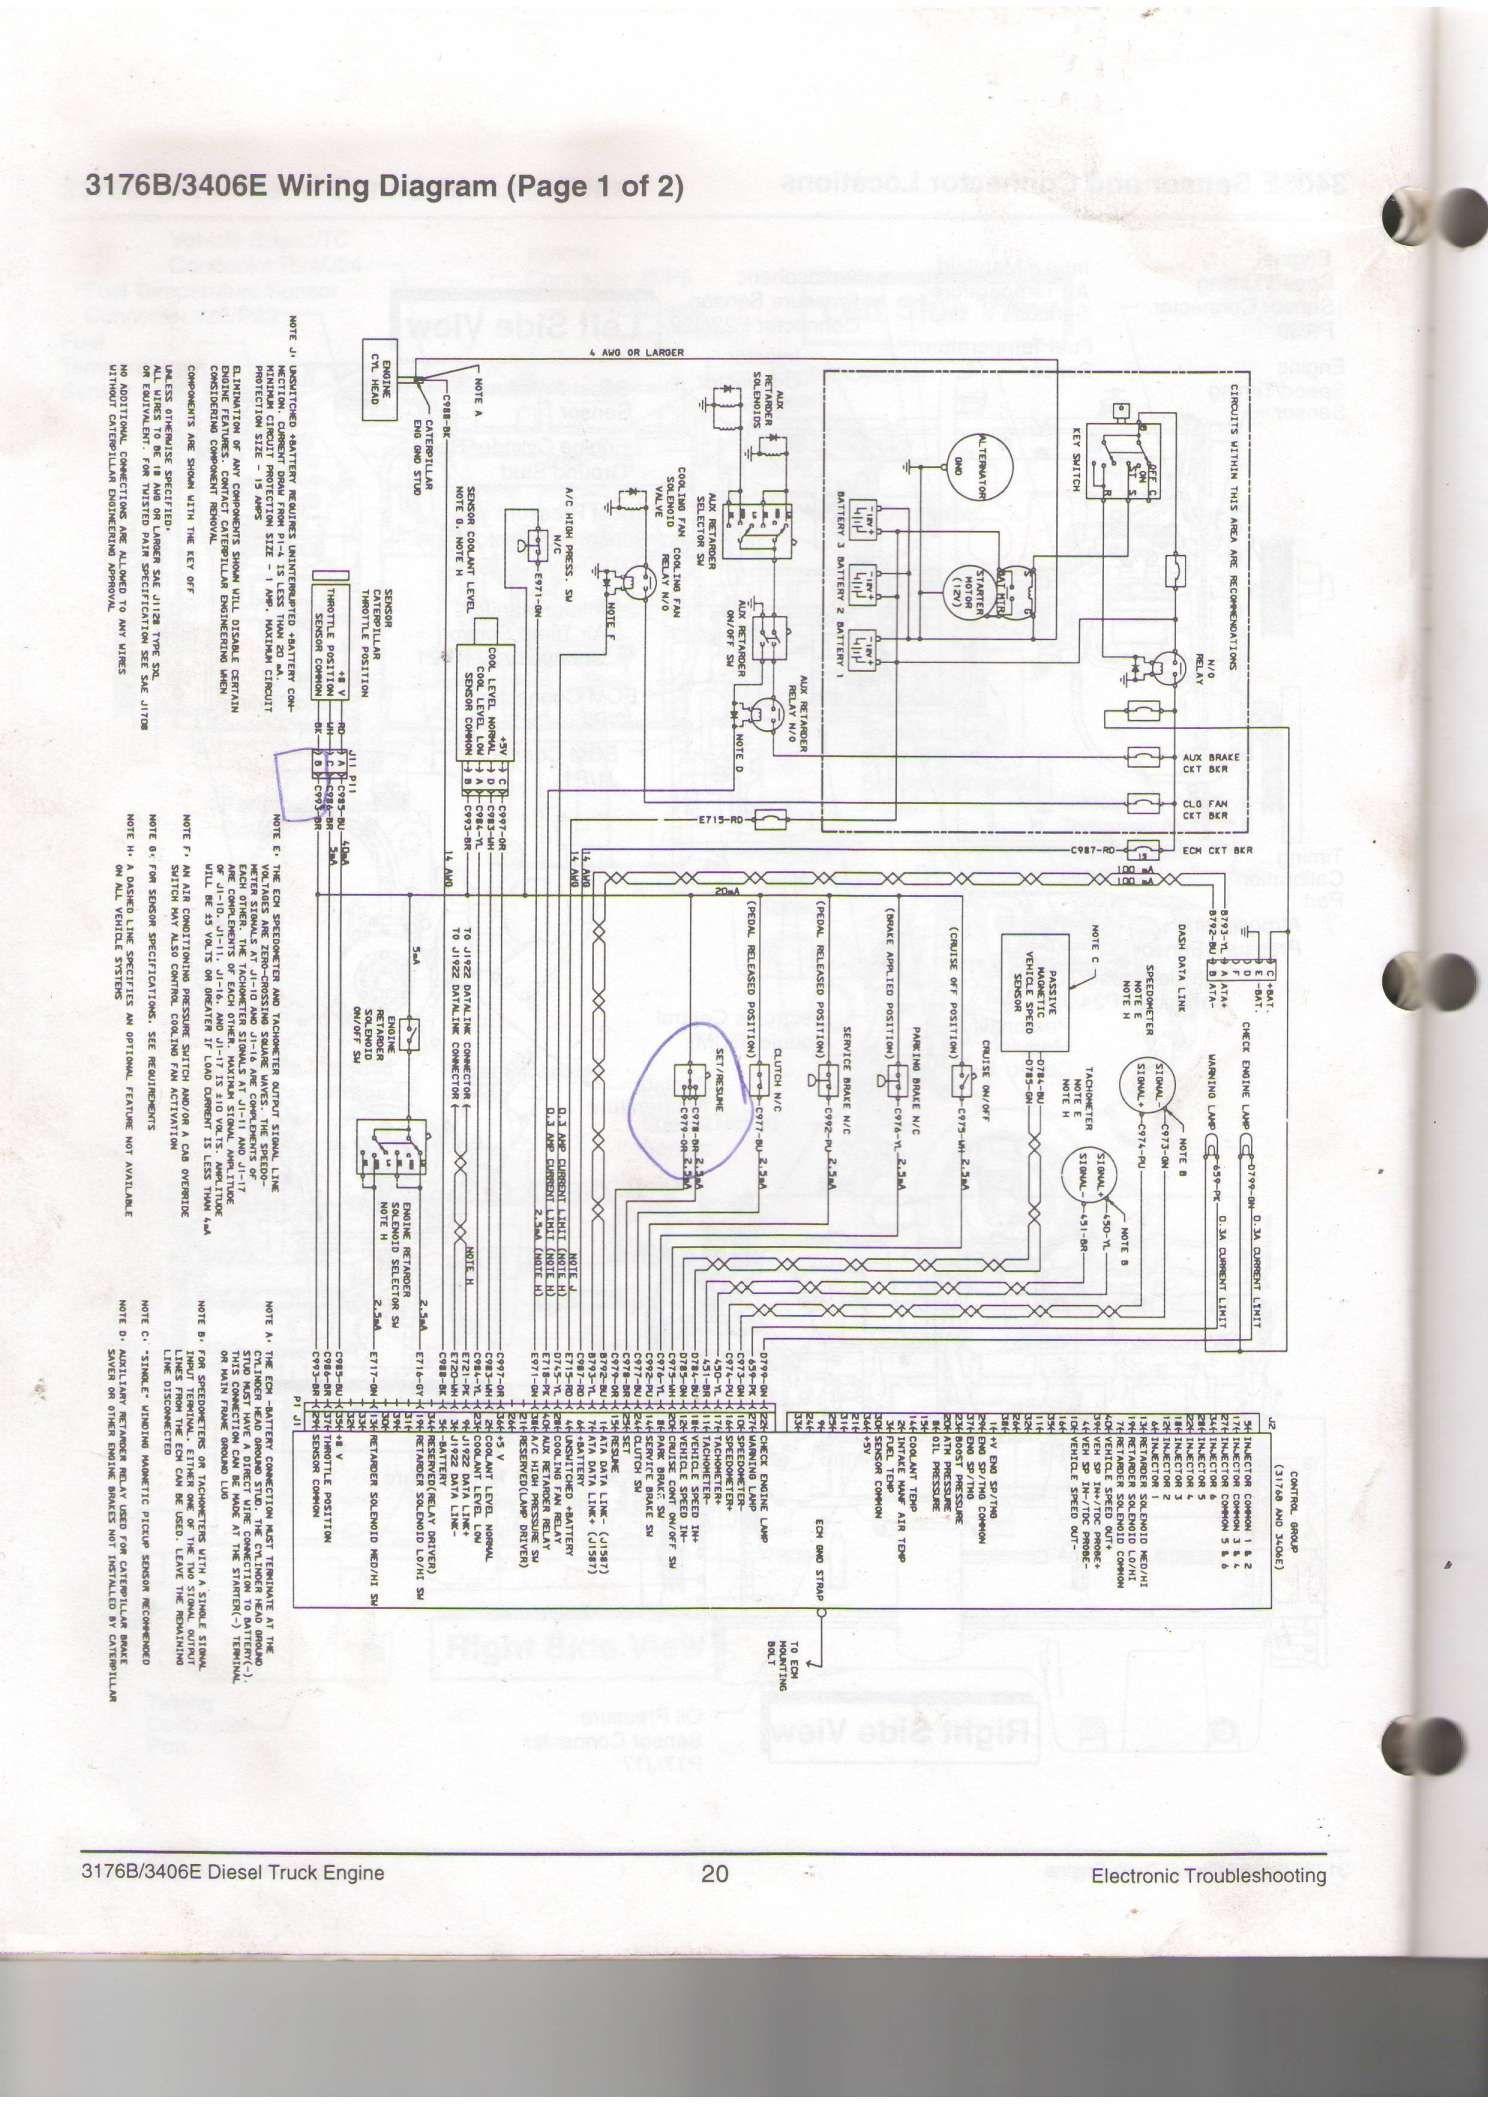 10 Engine Wiring Diagram Caterpillar Late Model 3406e Engine Diagram Wiringg Net Diagram Wire Cats